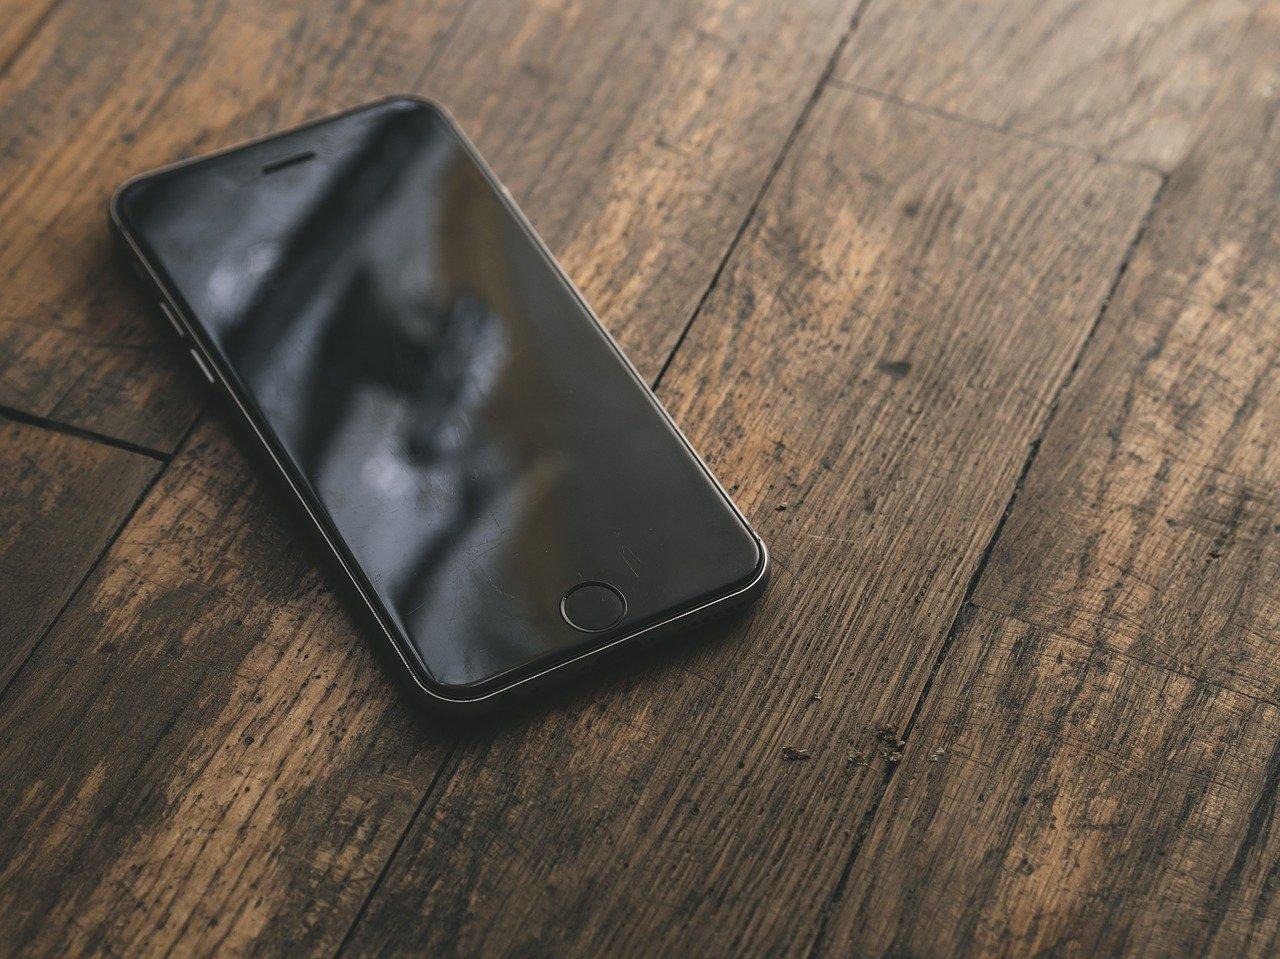 iOS apps to measure noise level (decibel meter)